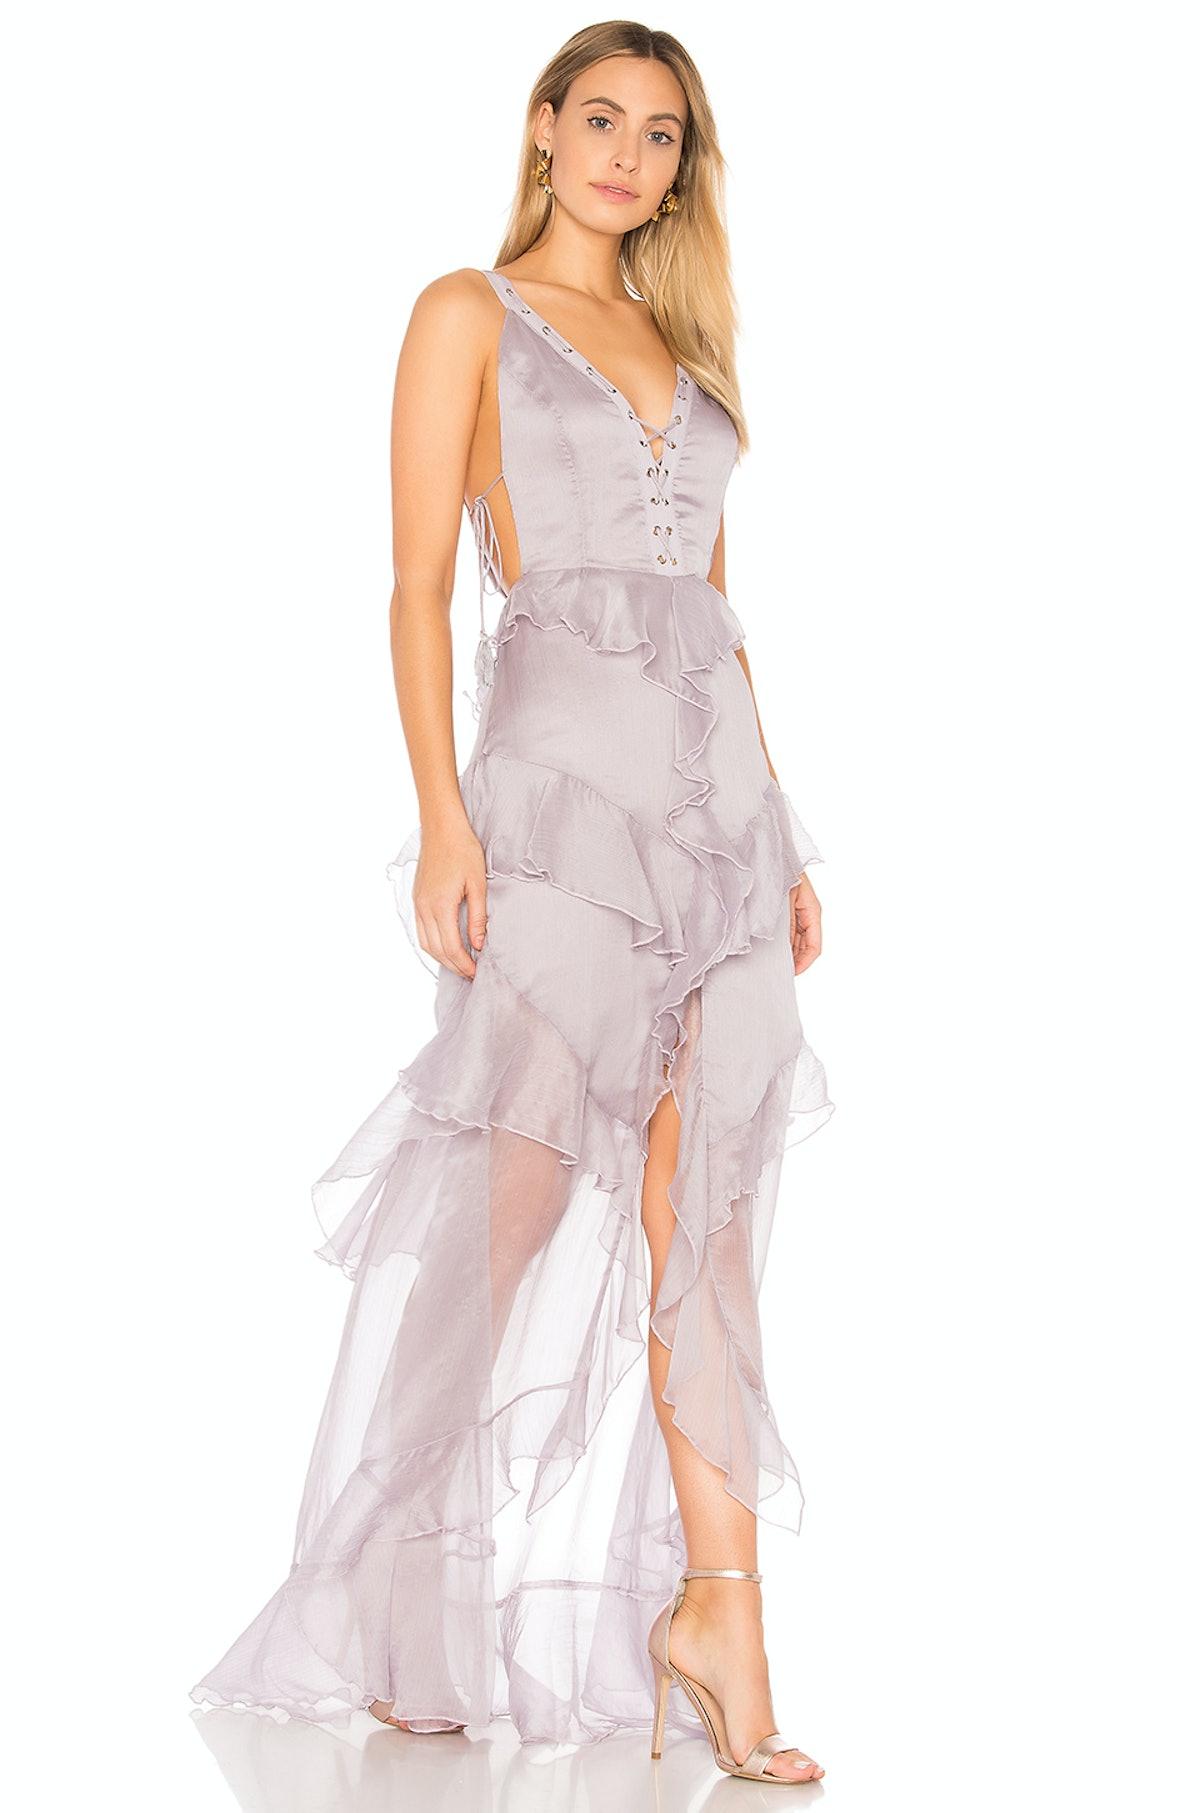 Olympus Maxi Dress, $310, The Jetset Diaries